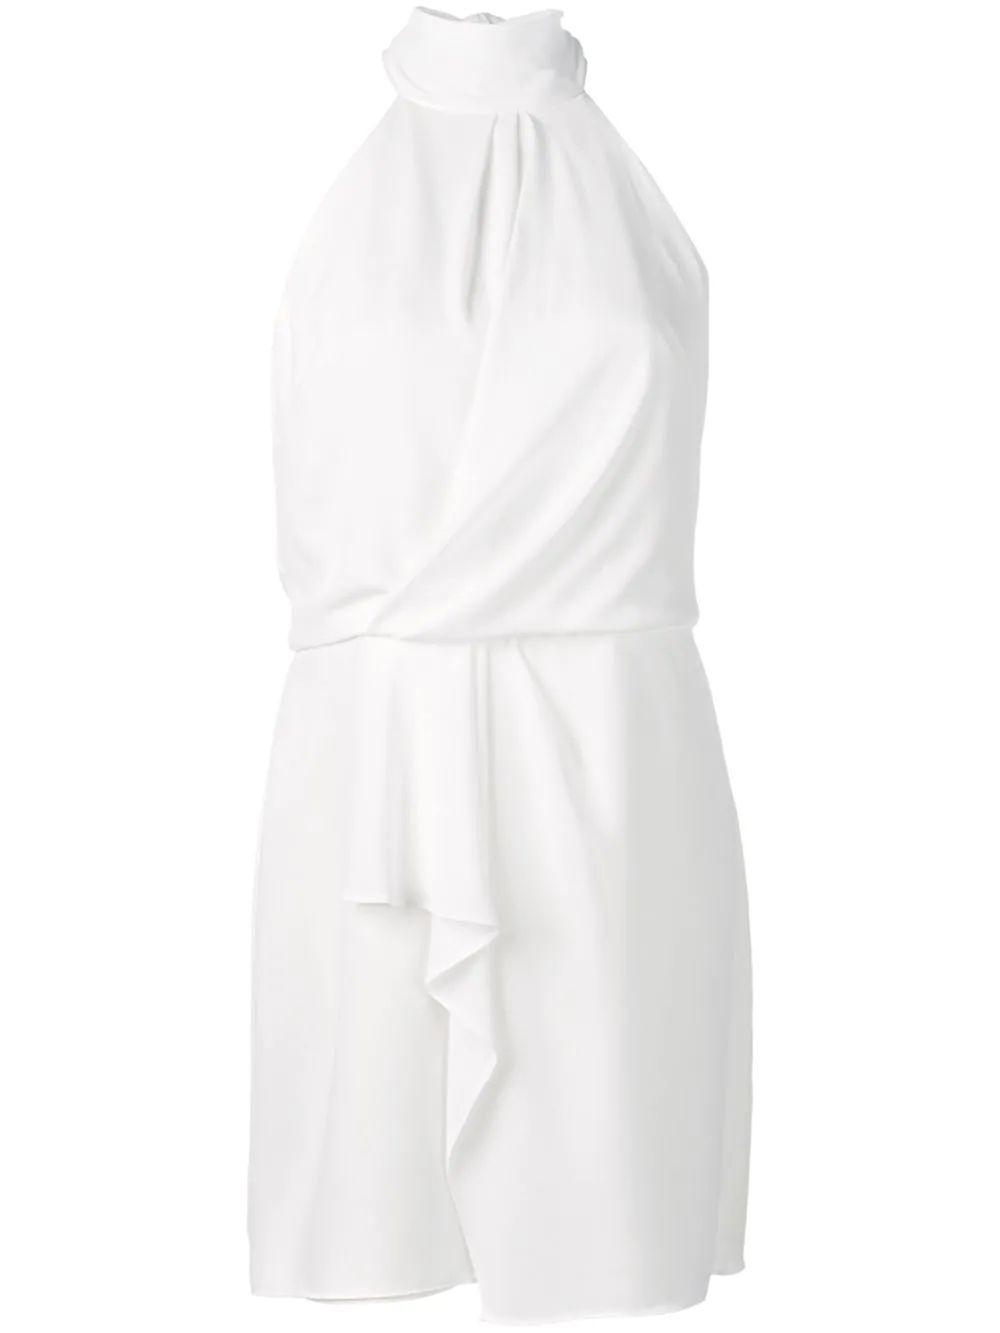 Sleeveless Mock Neck Dress With Drape Detail